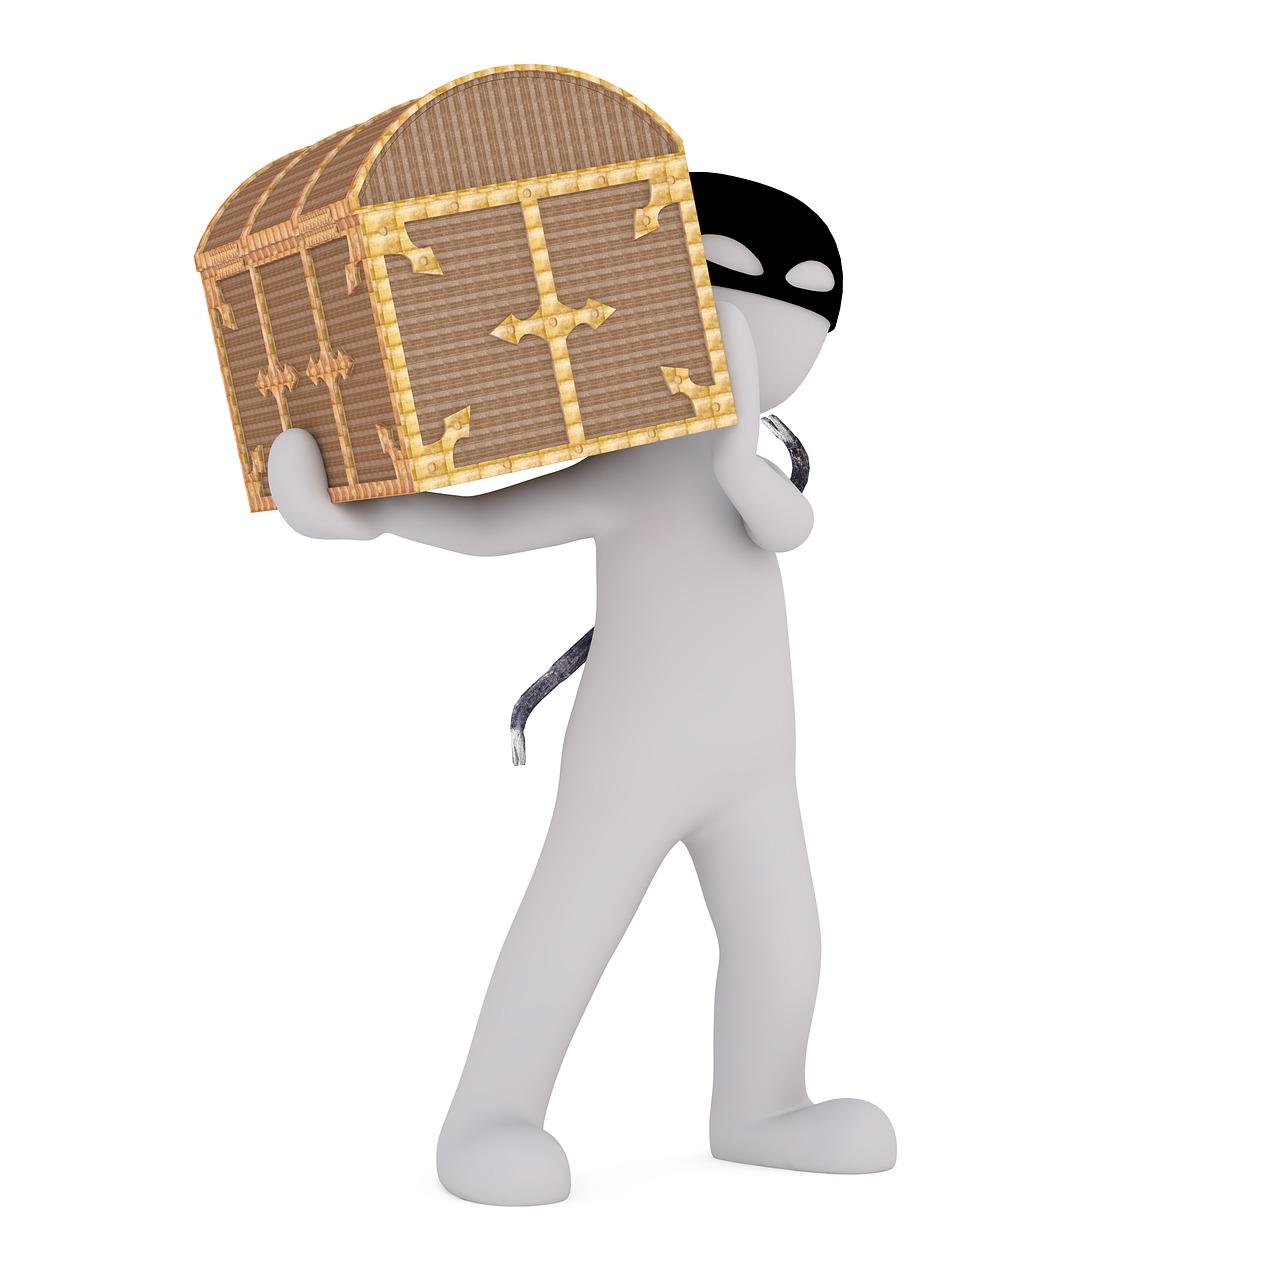 thief-1825713_1280